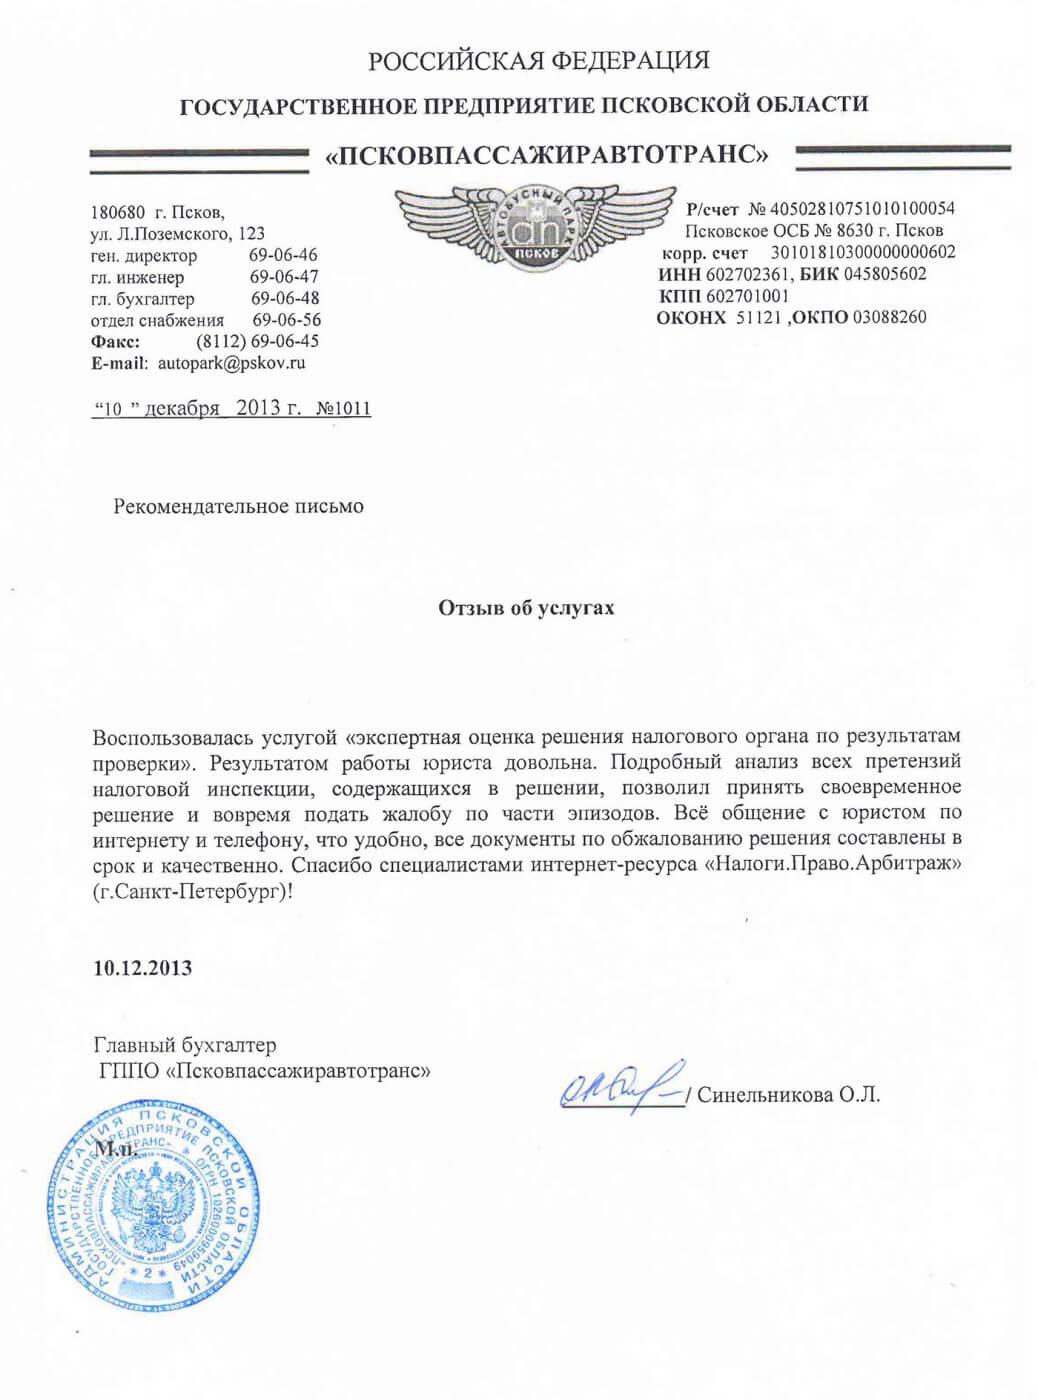 Rekomendatelnoe Pskov